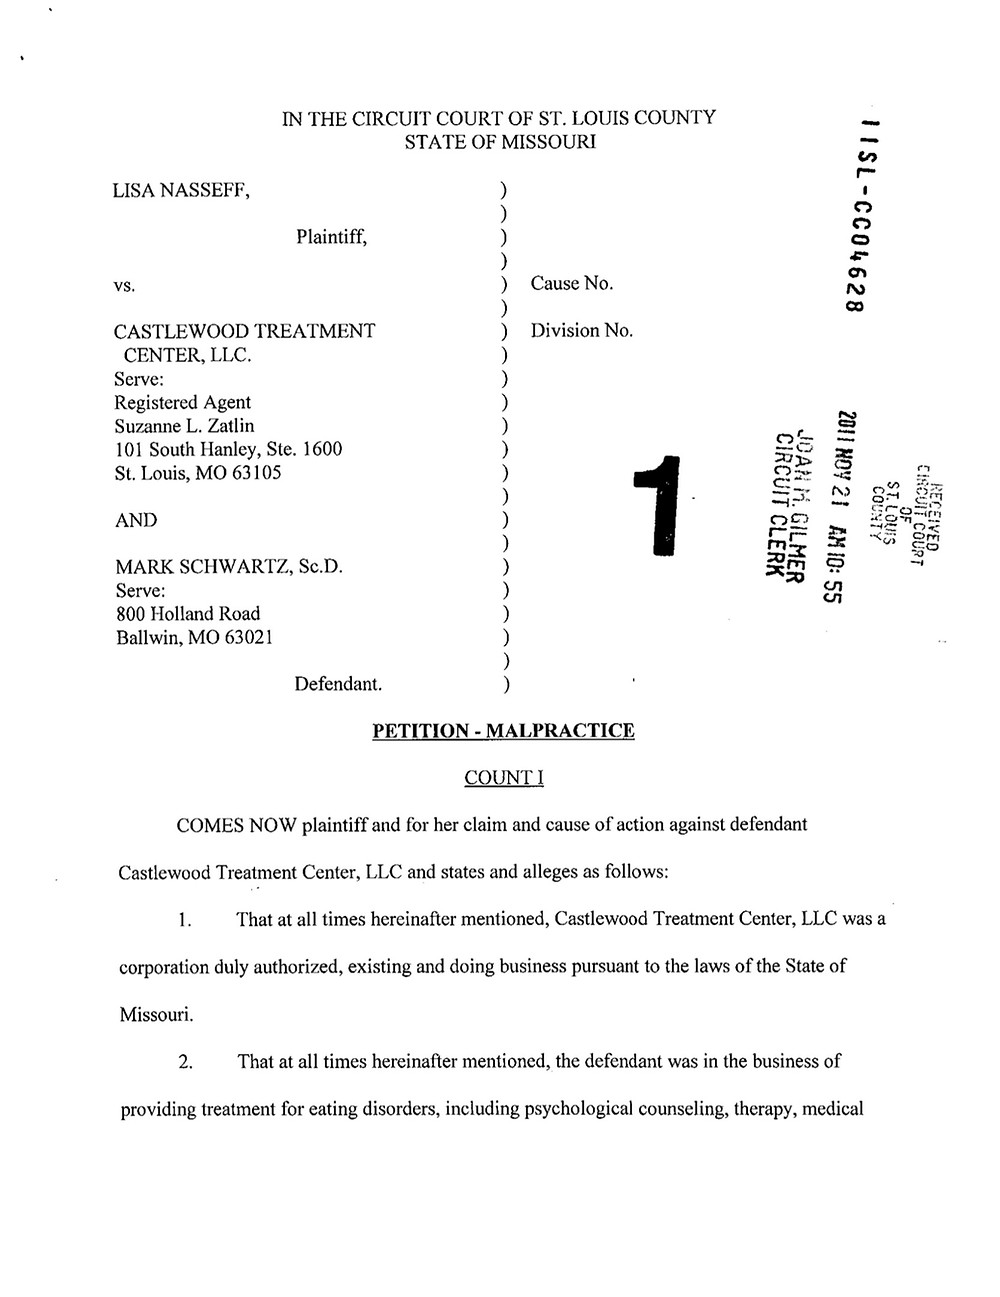 Castlewood Treatment Center Lawsuit - Lisa Nasseff